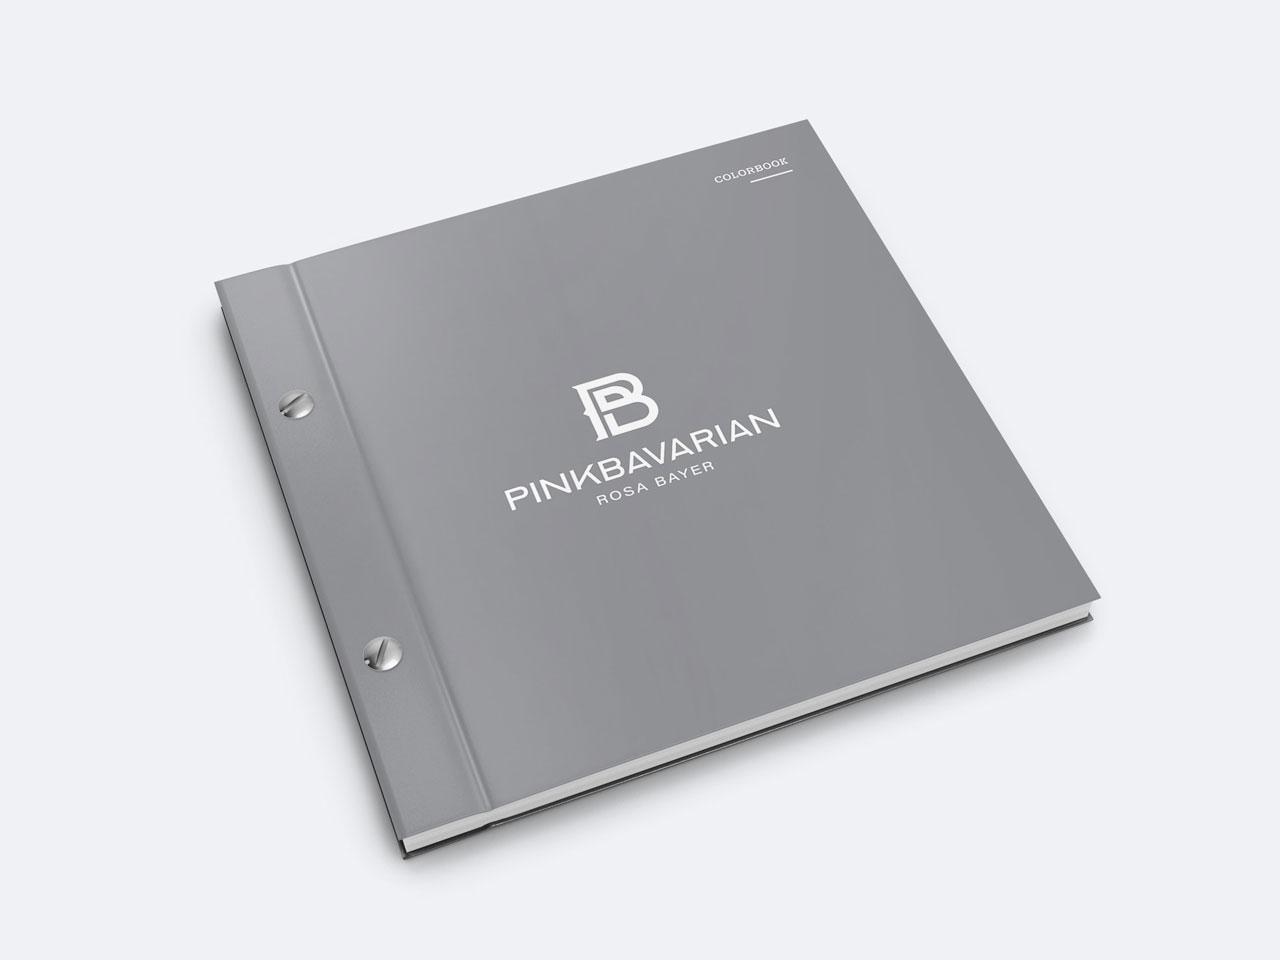 renoarde pinkbavarian print 001